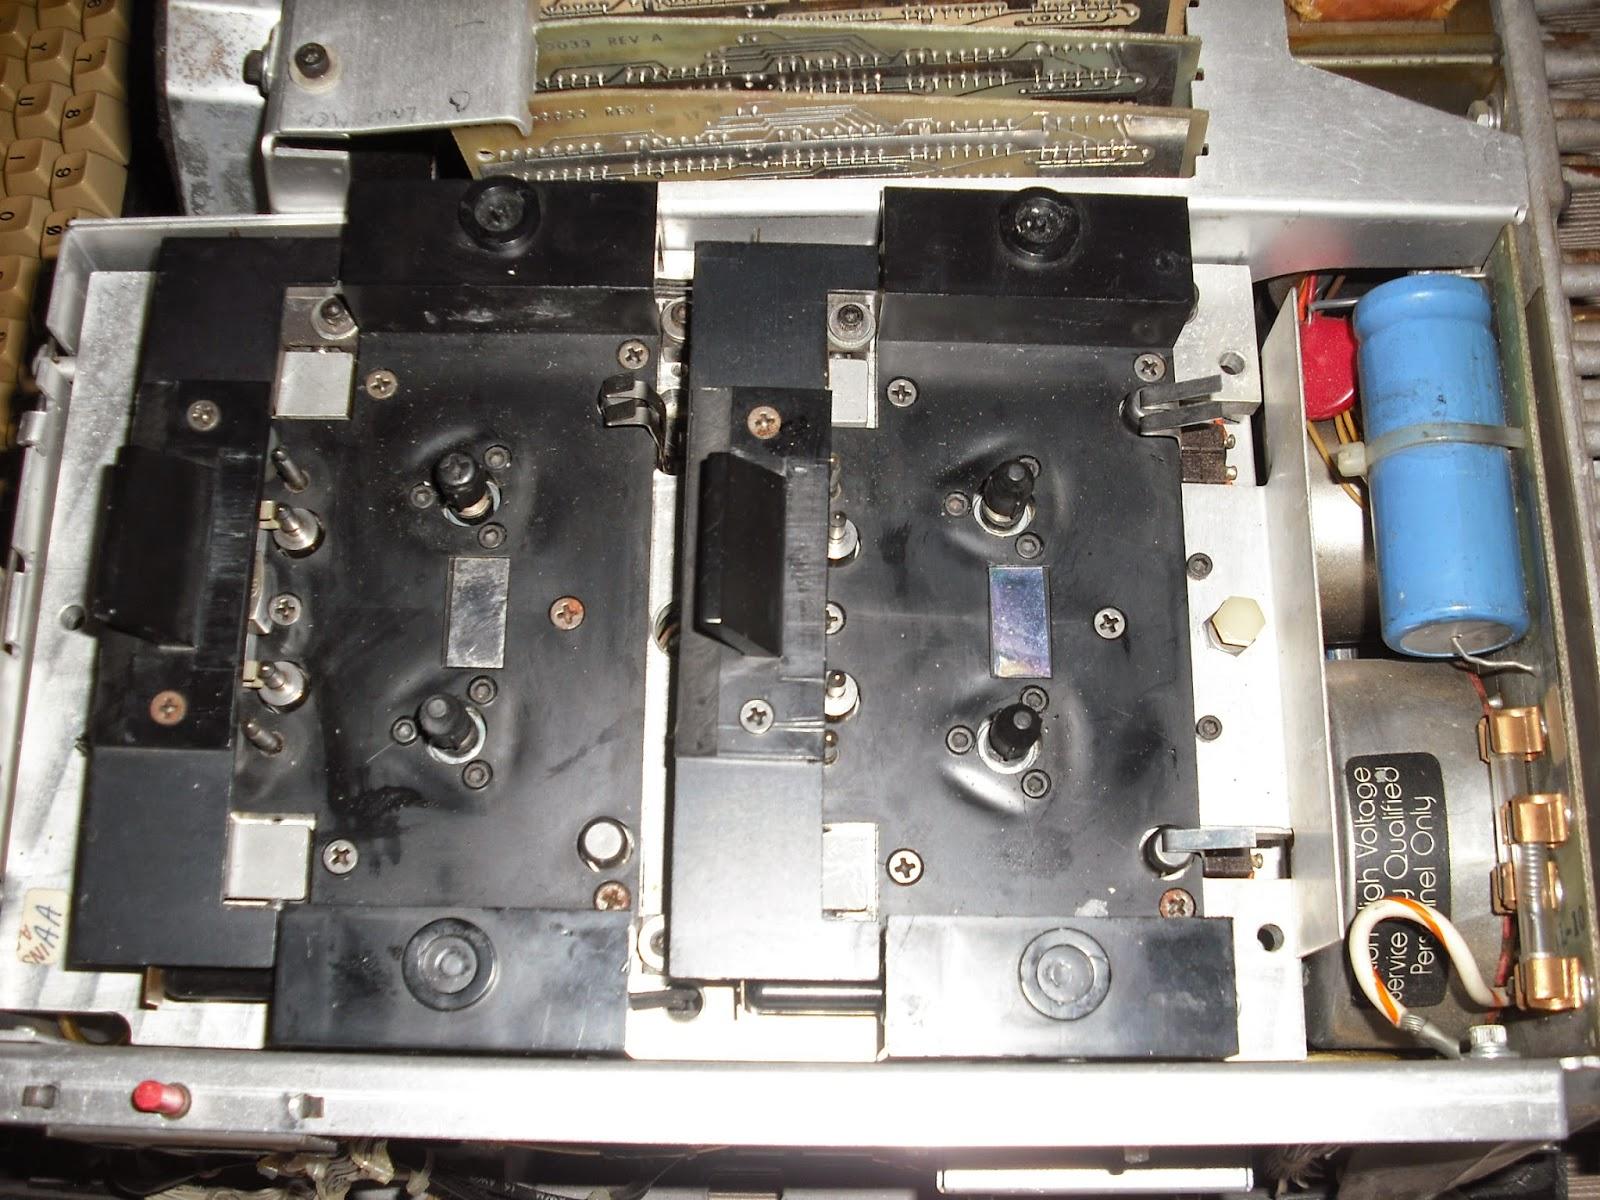 CTC2200 cassette tape decks